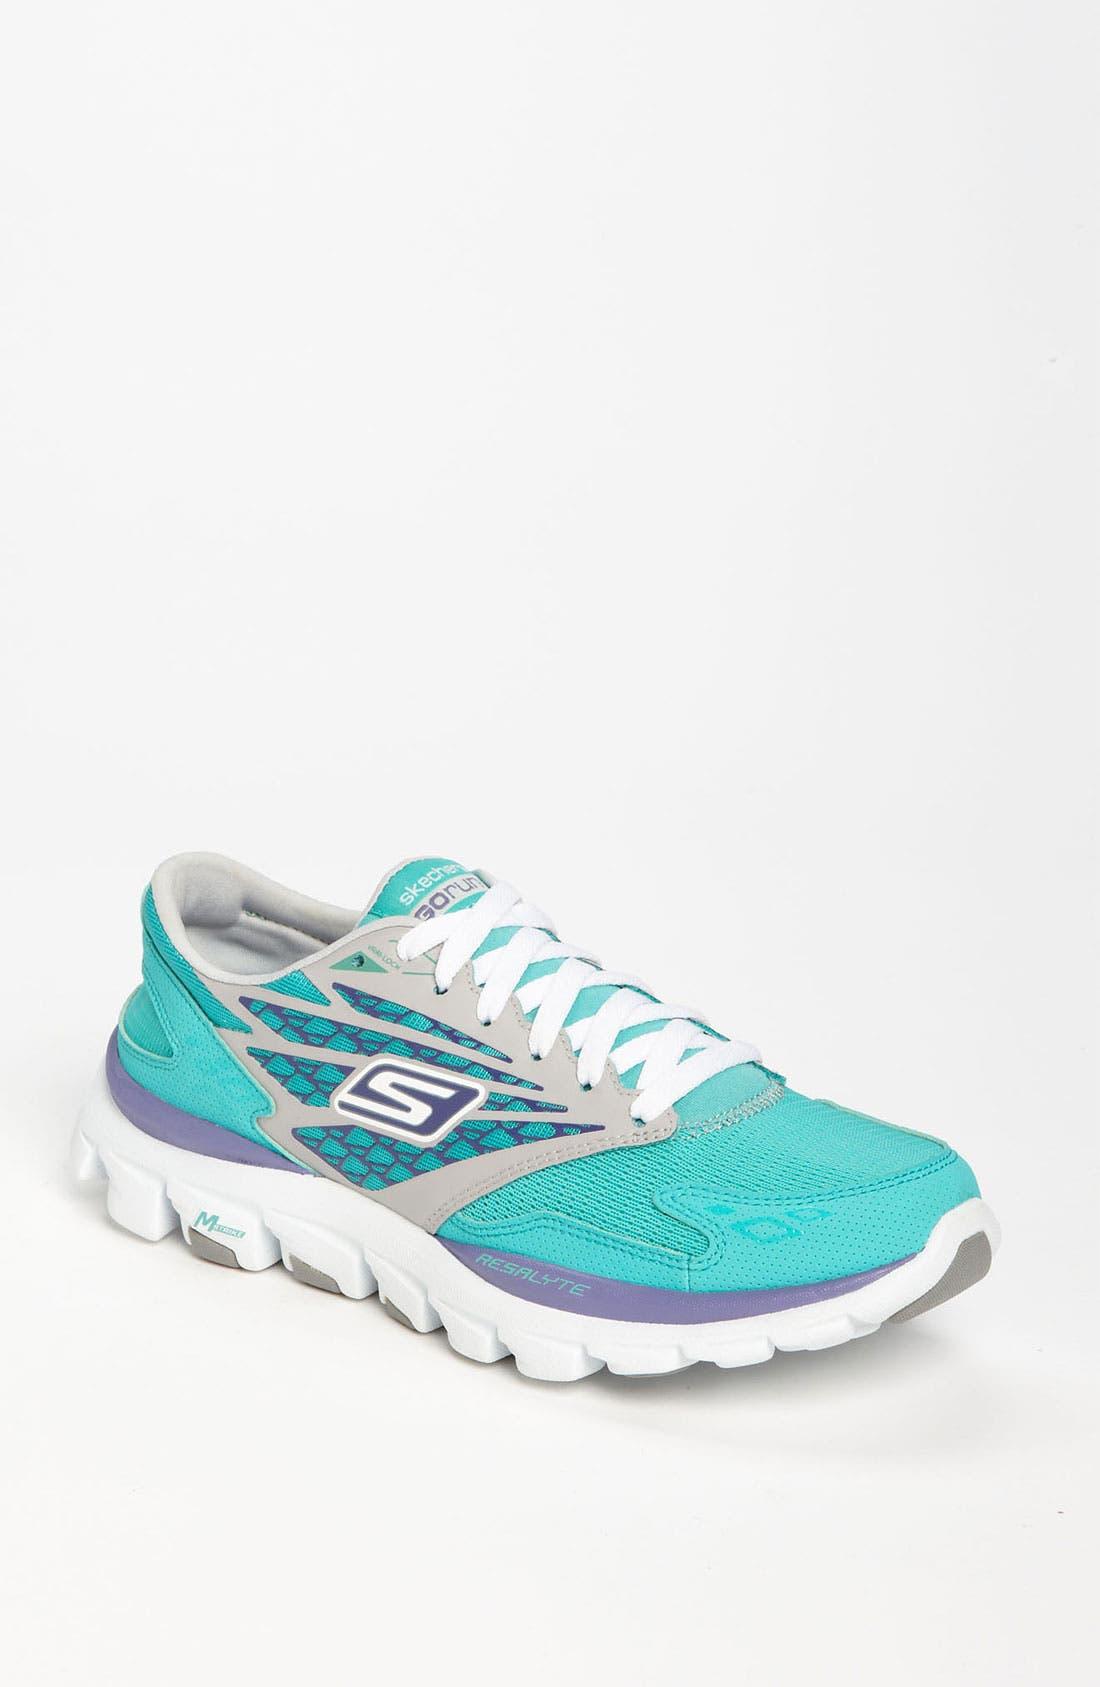 Alternate Image 1 Selected - SKECHERS 'GOrun Ride' Running Shoe (Women)